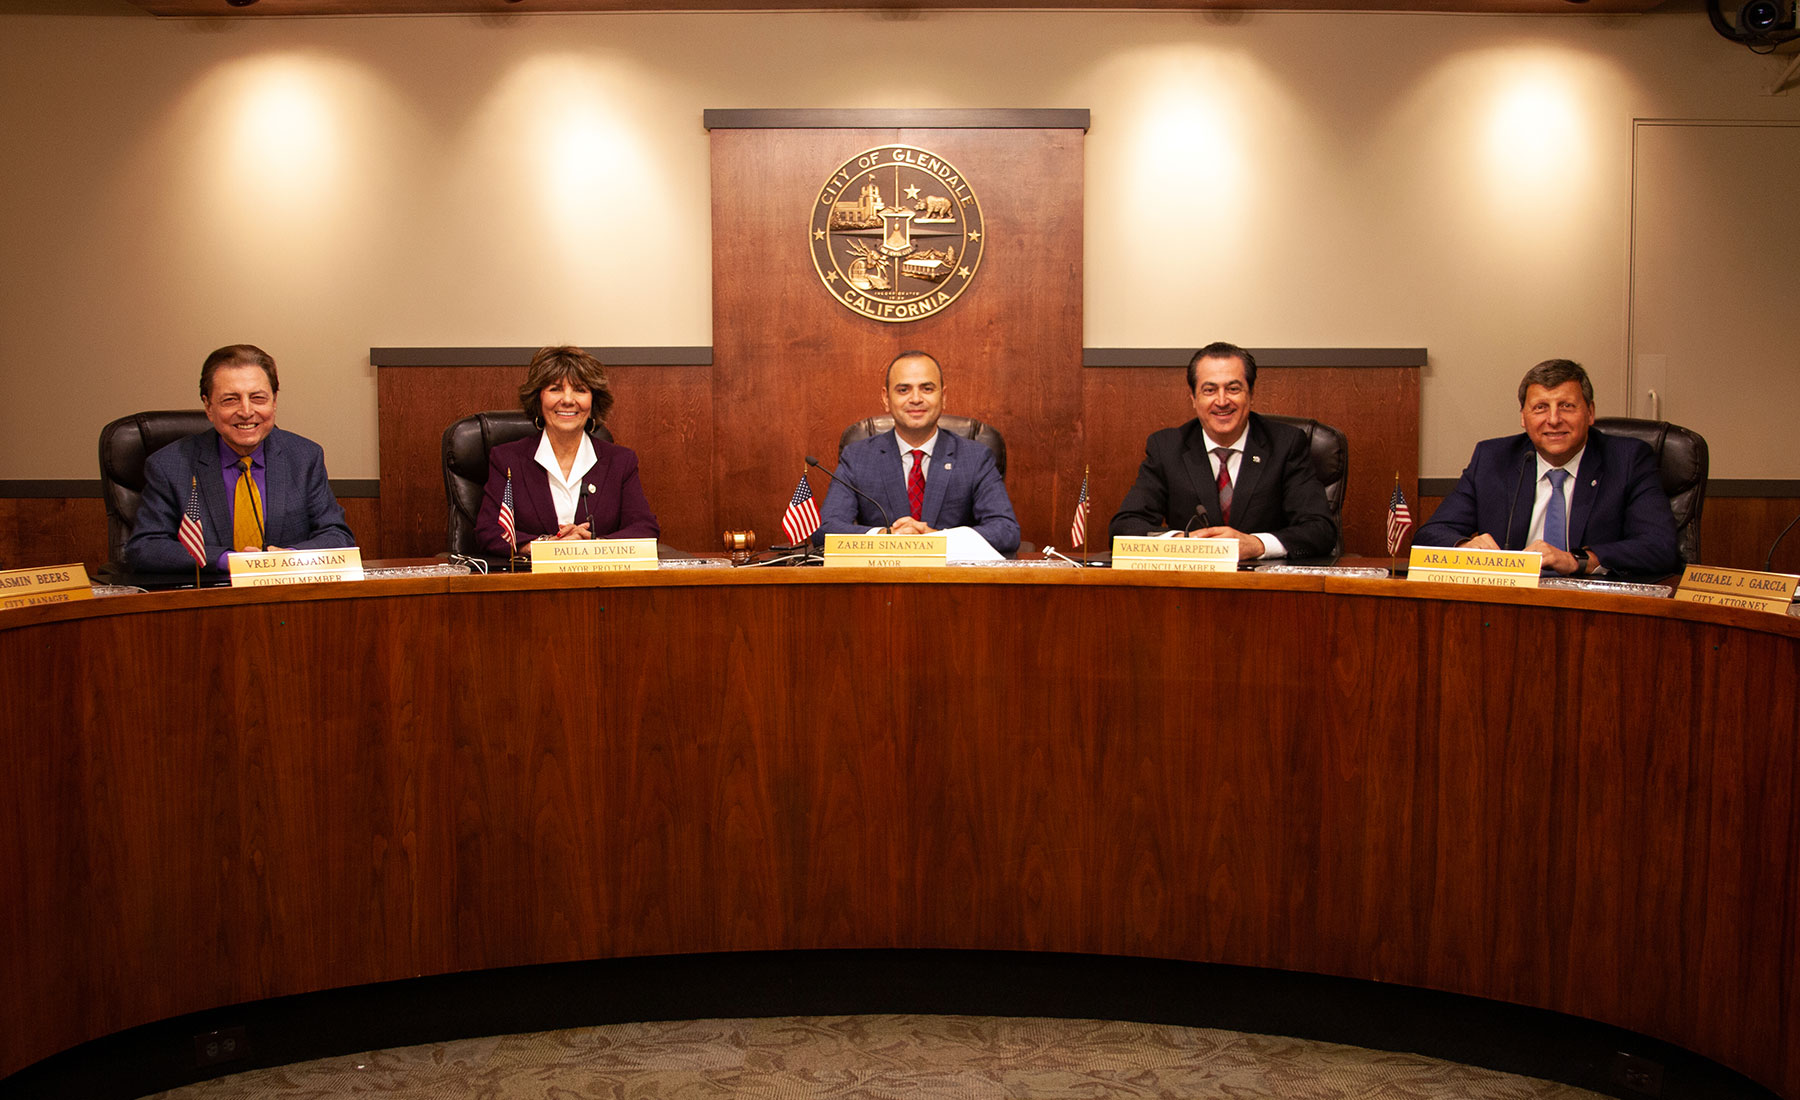 Armenian American Museum to Honor Glendale City Council at Inaugural Gala